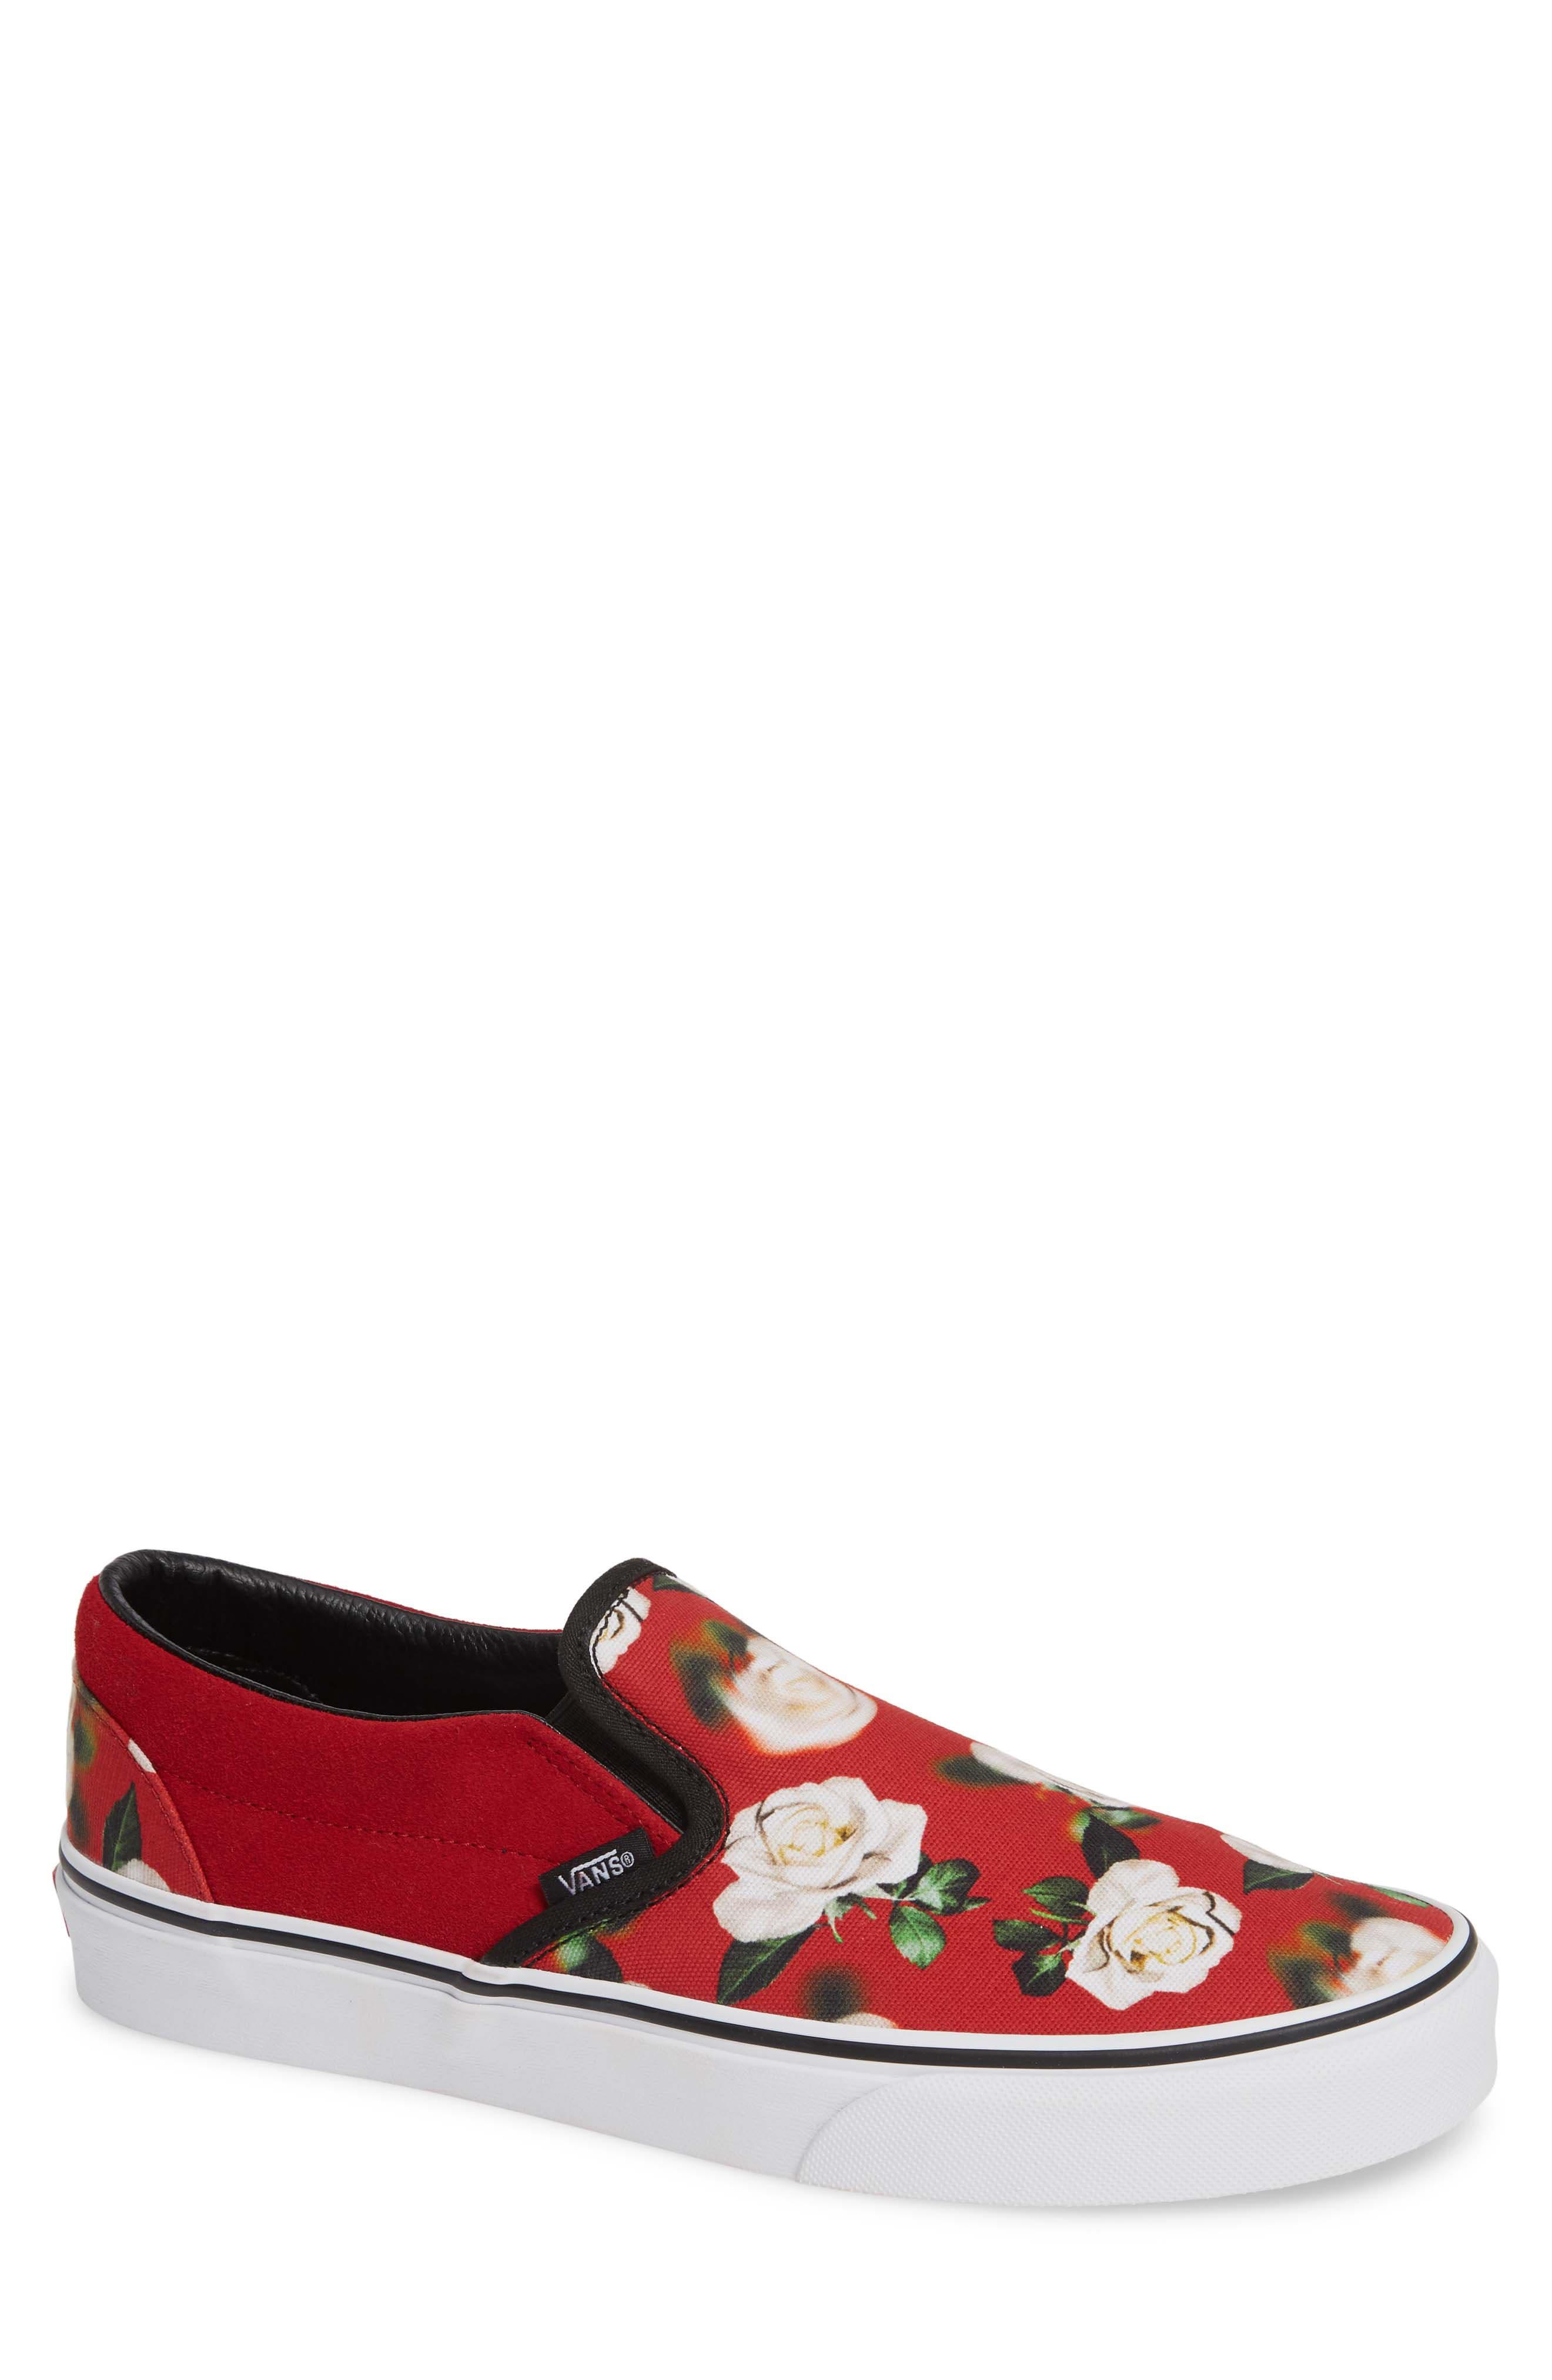 'Classic' Slip-On Sneaker, Main, color, CHILI PEPPER/ ROMANTIC FLORAL